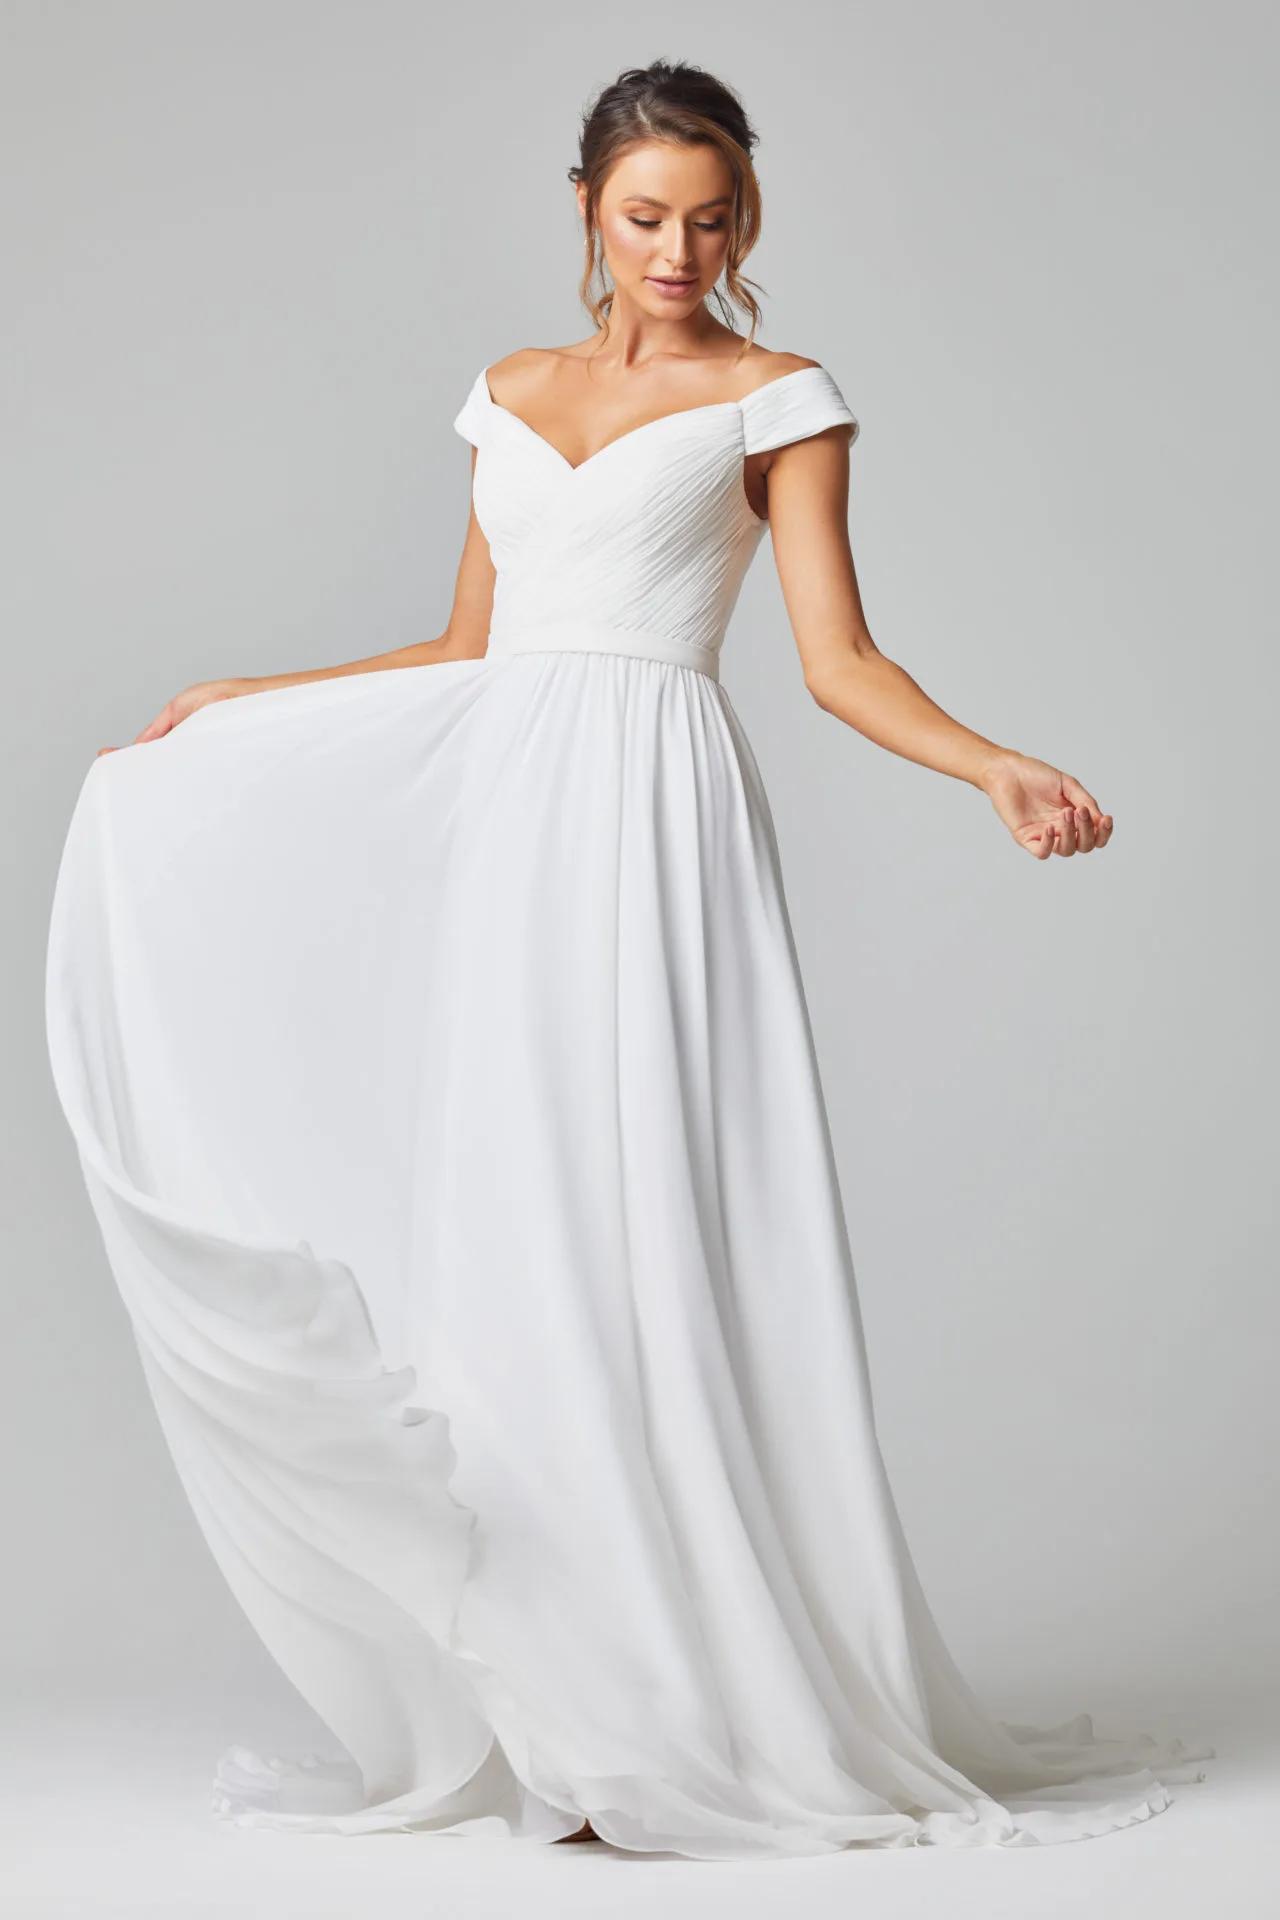 Annabelle Wedding Dress by Tania Olsen - Vintage White